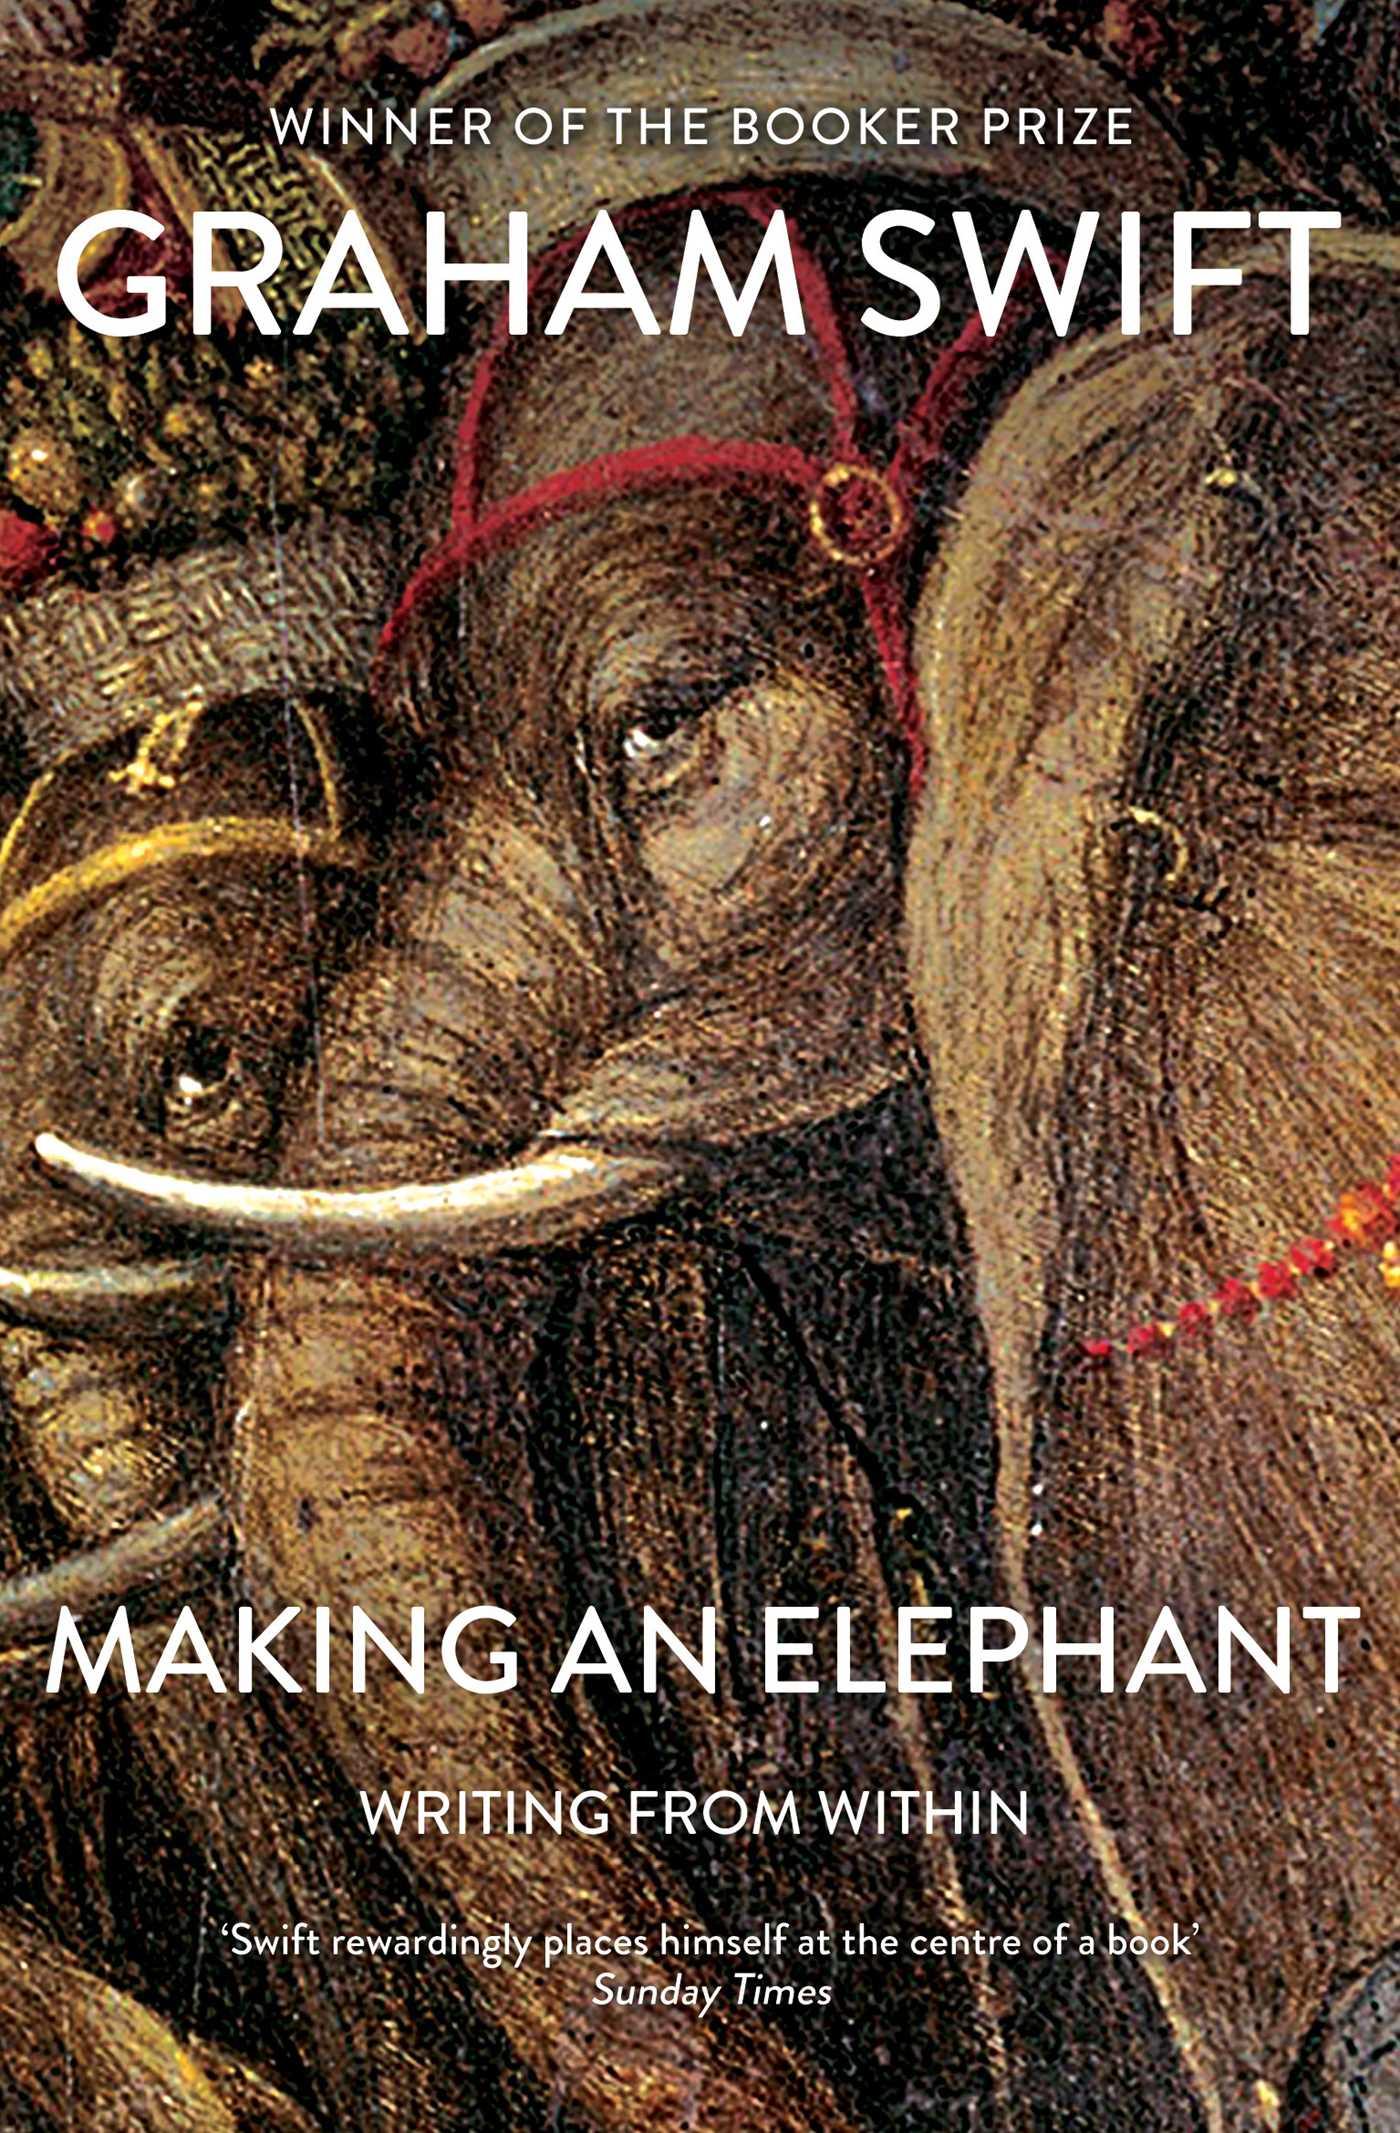 Making an elephant 9781471161957 hr